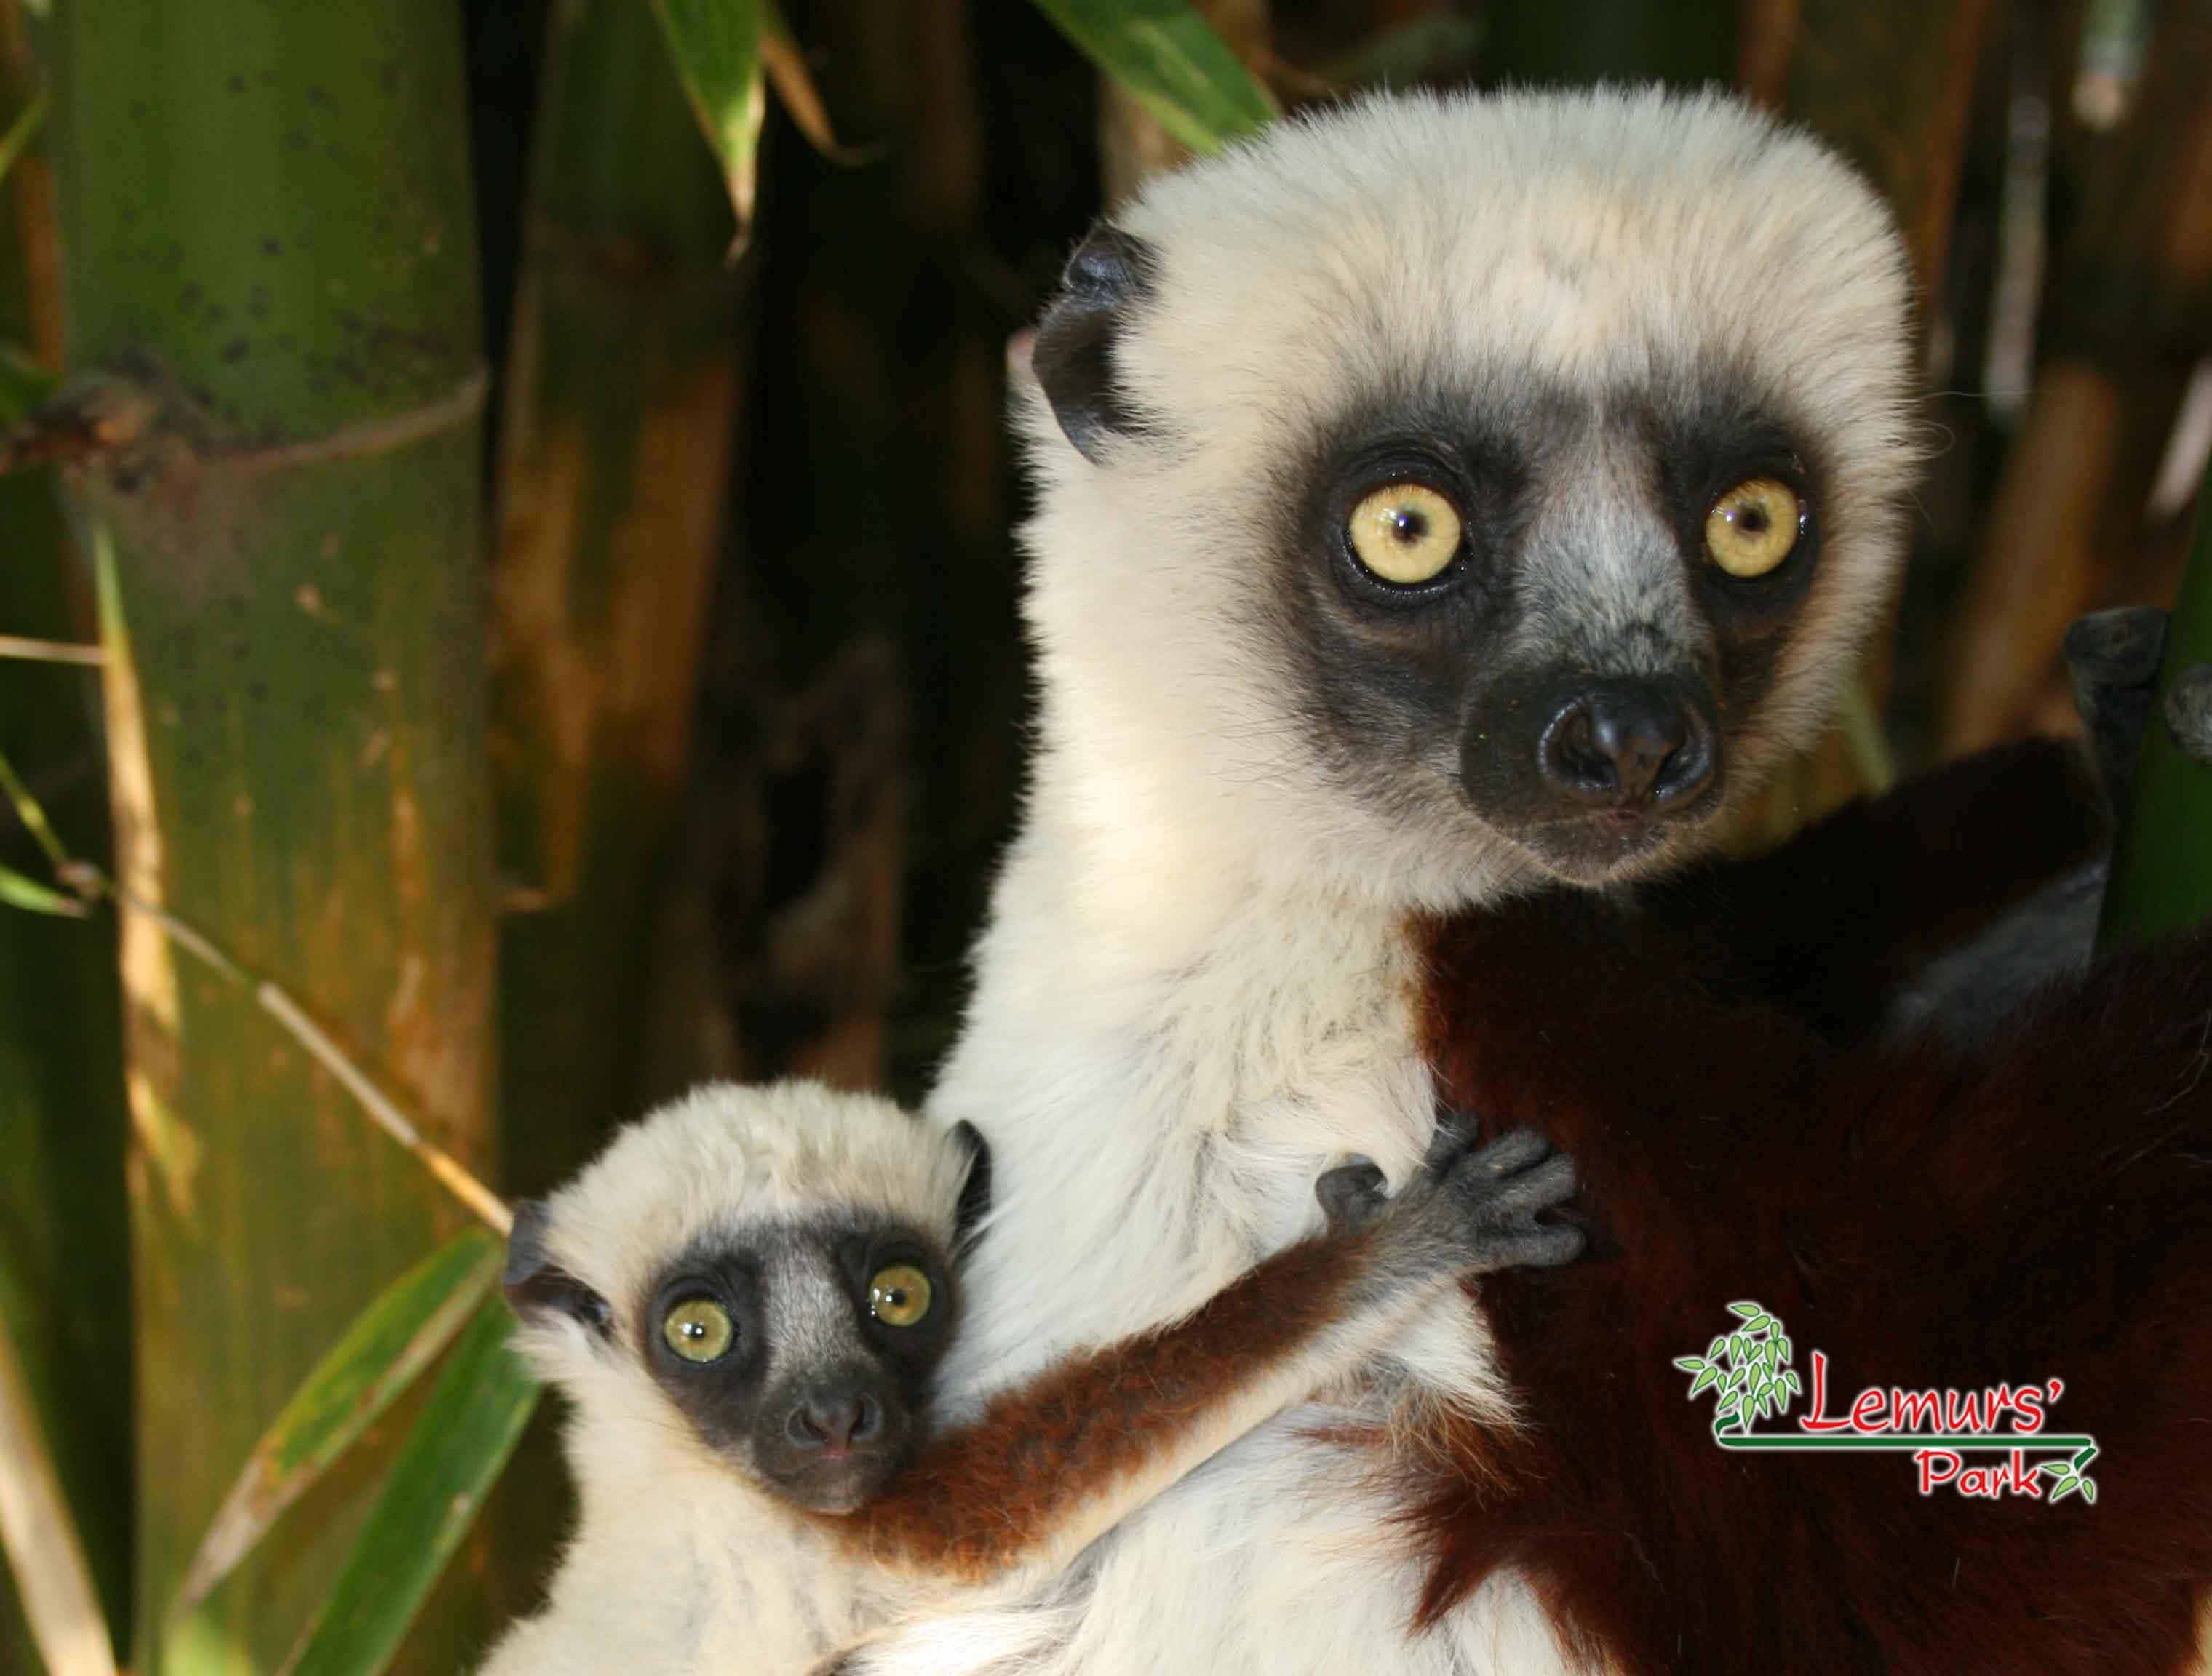 Lemurs'Park Sifaka Baby